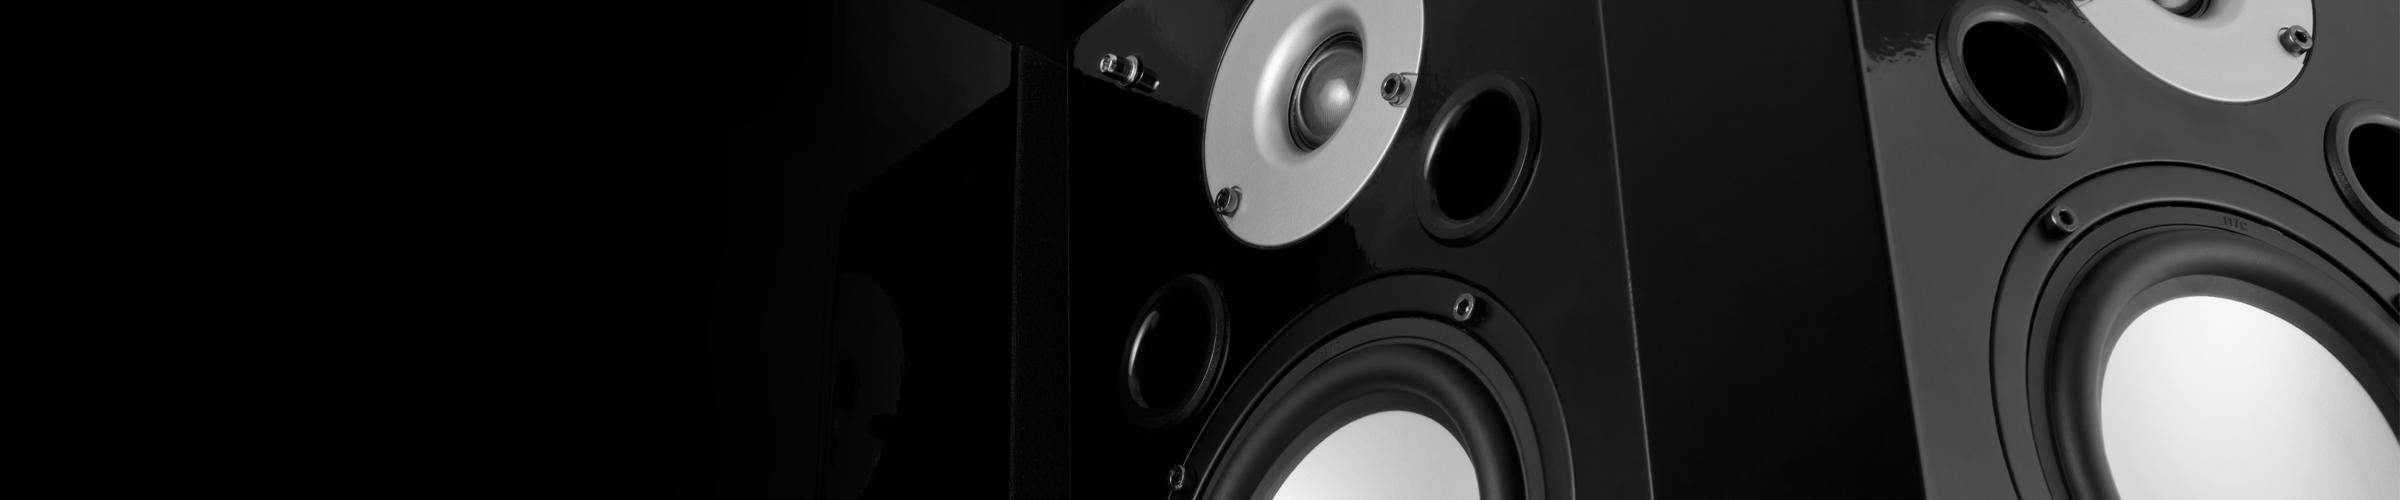 XLBP Bipolar Surround Sound Speakers Intro